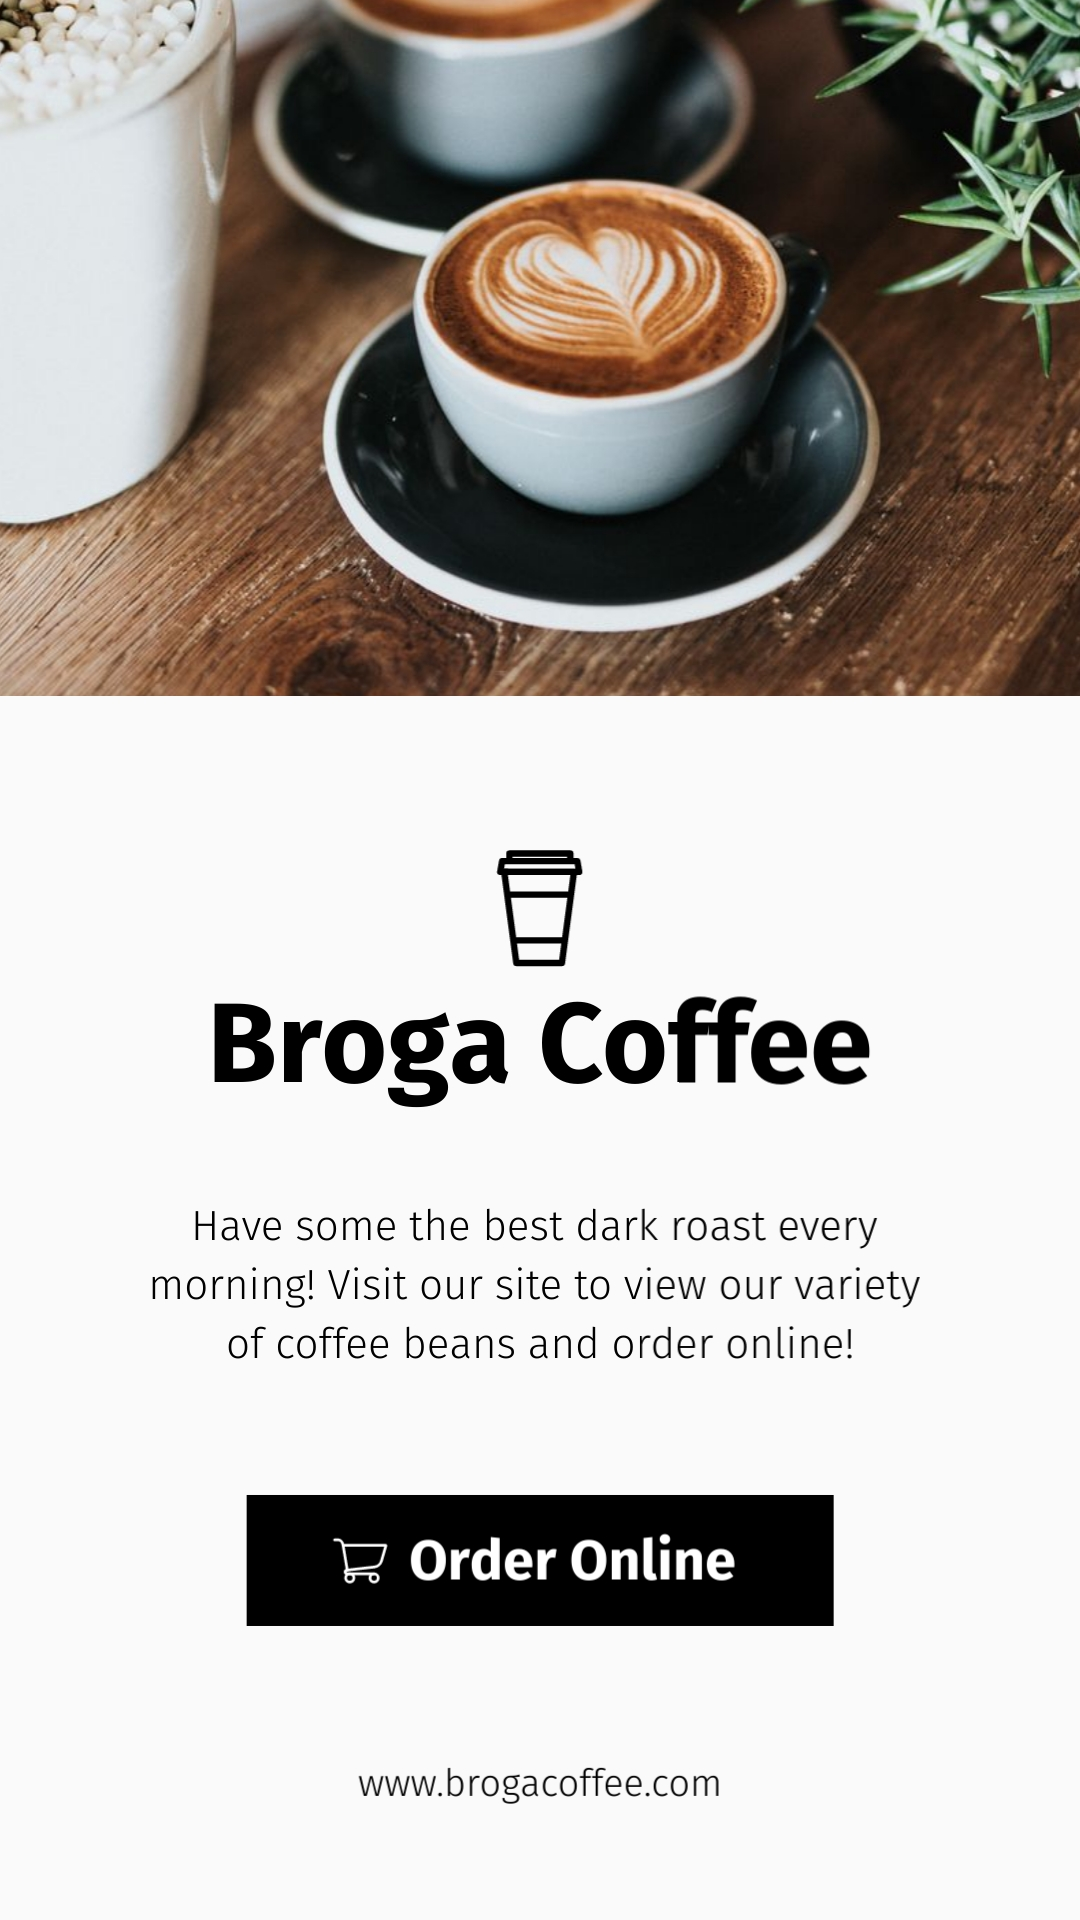 Broga Coffee Shop Vertical Template